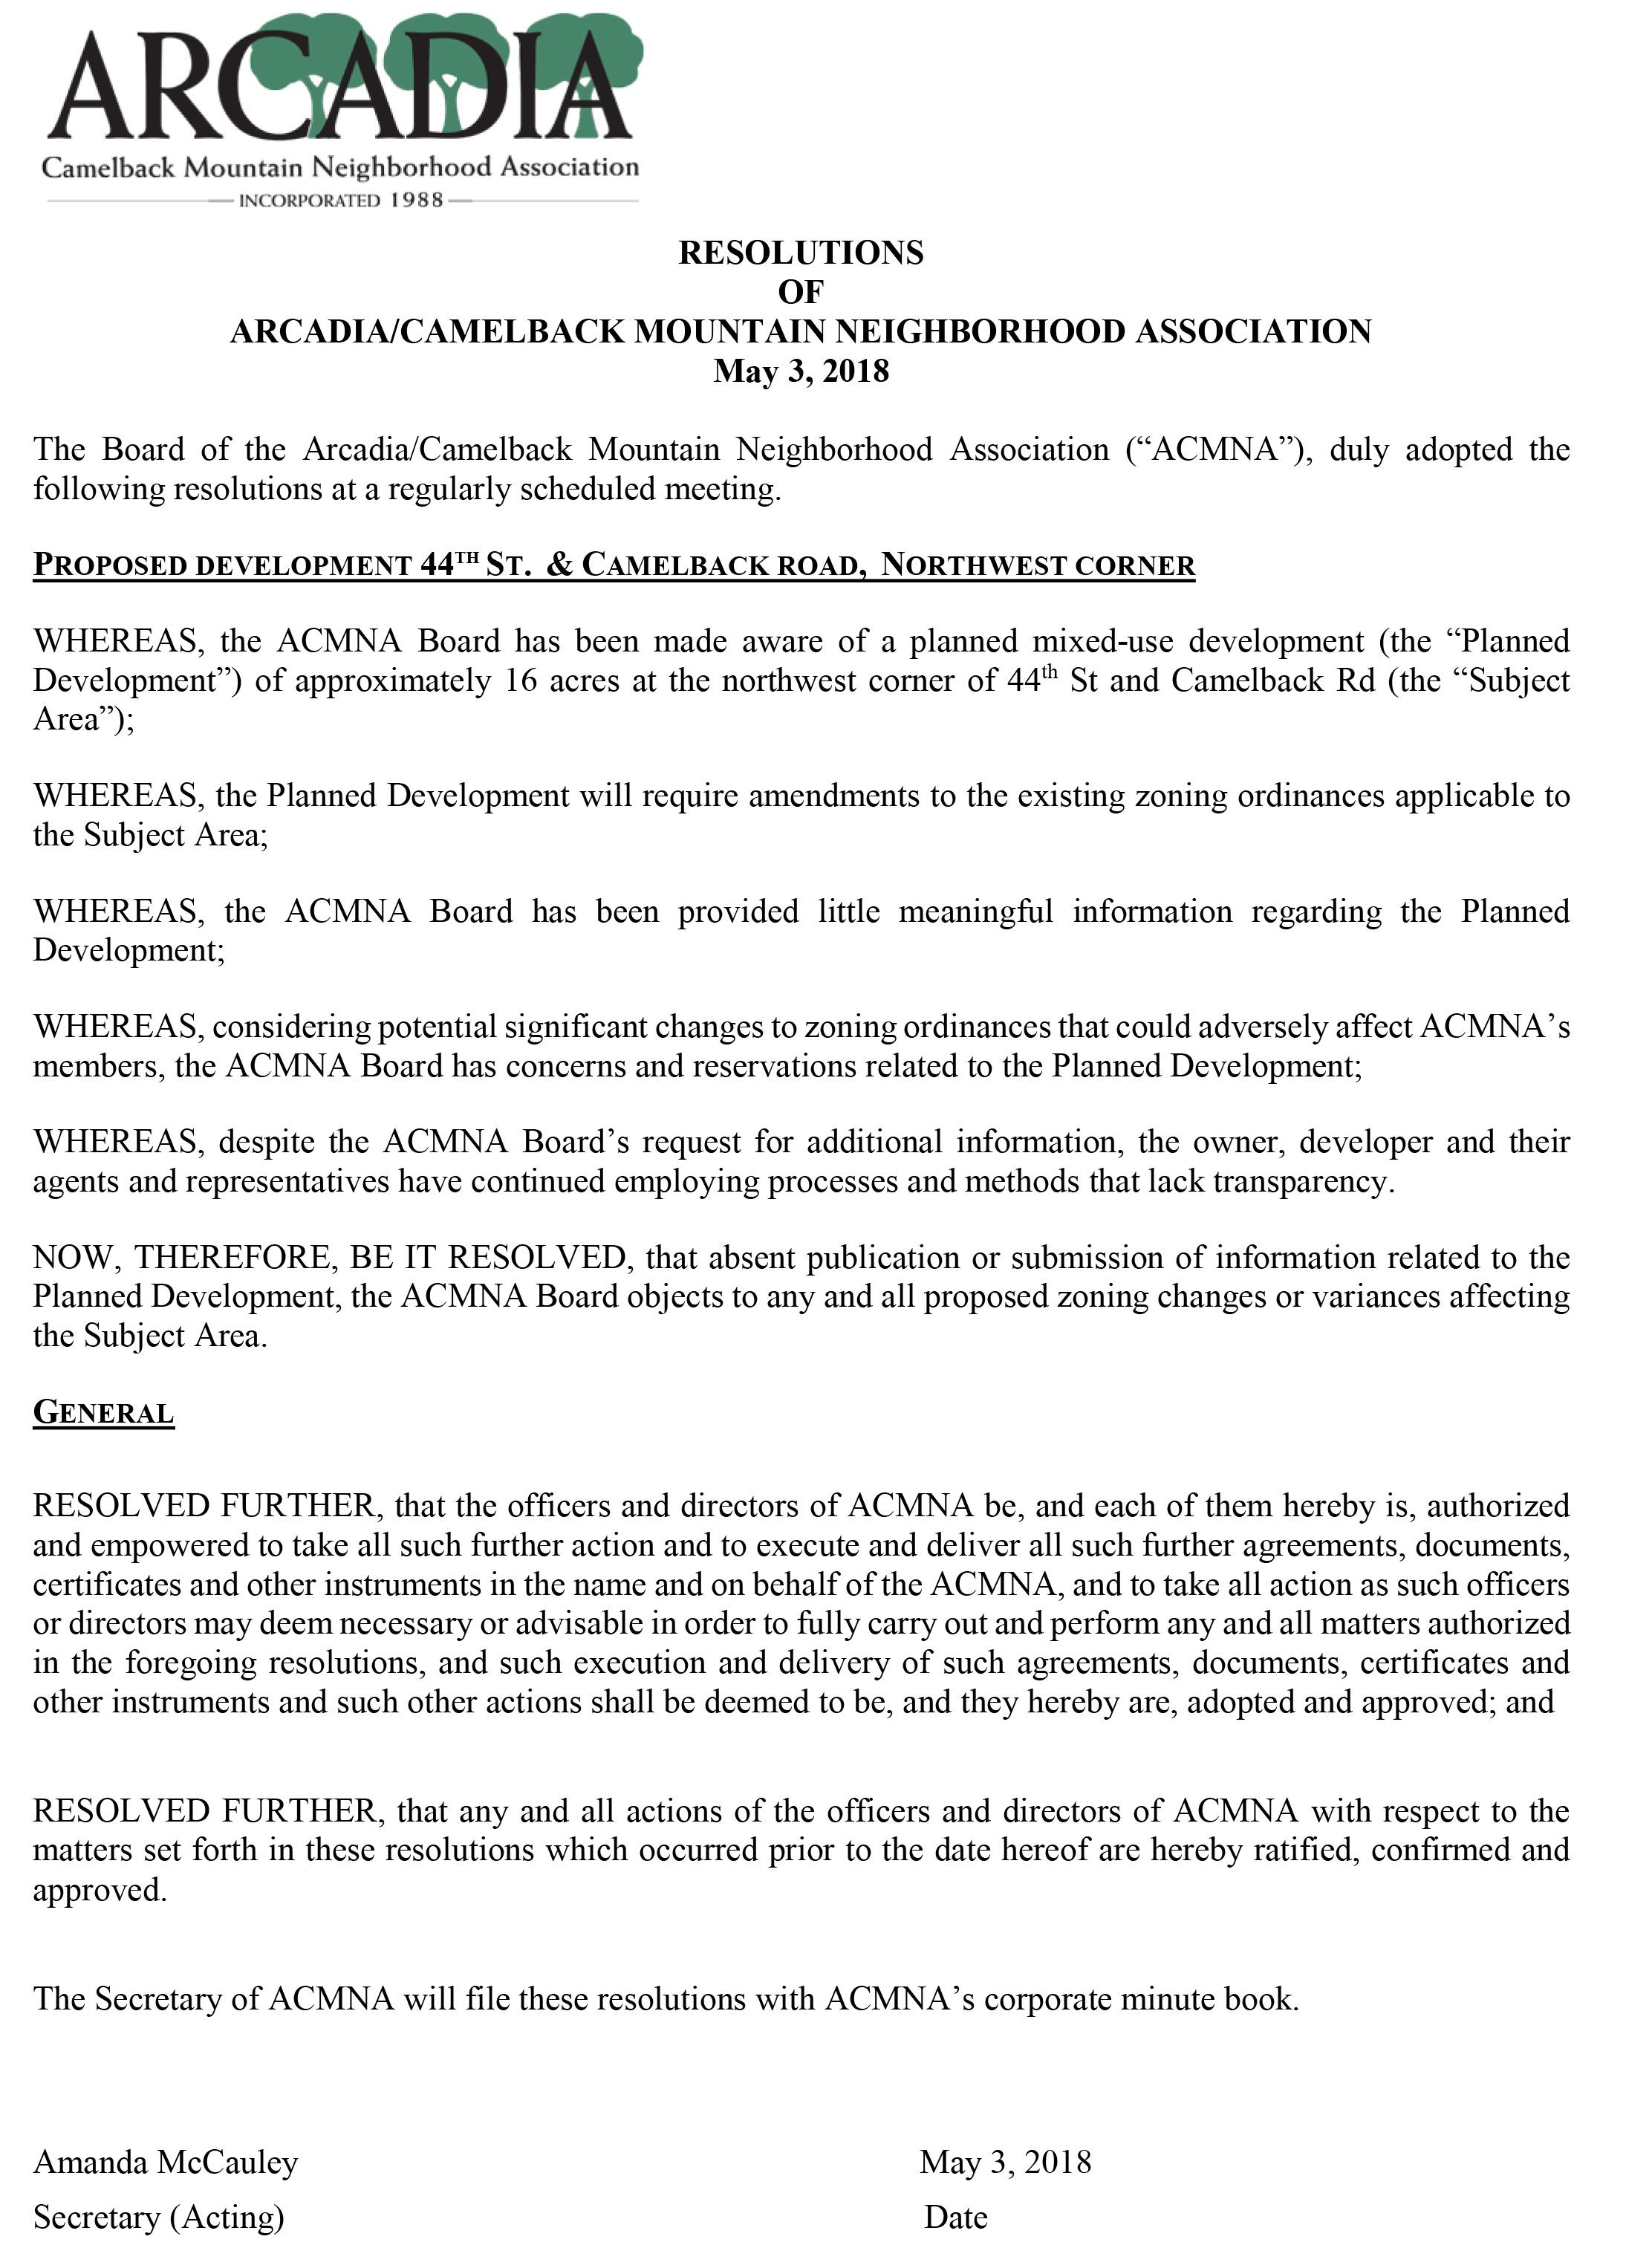 ACMNA Board Resolution 44th & Camelback Leterhead.jpg